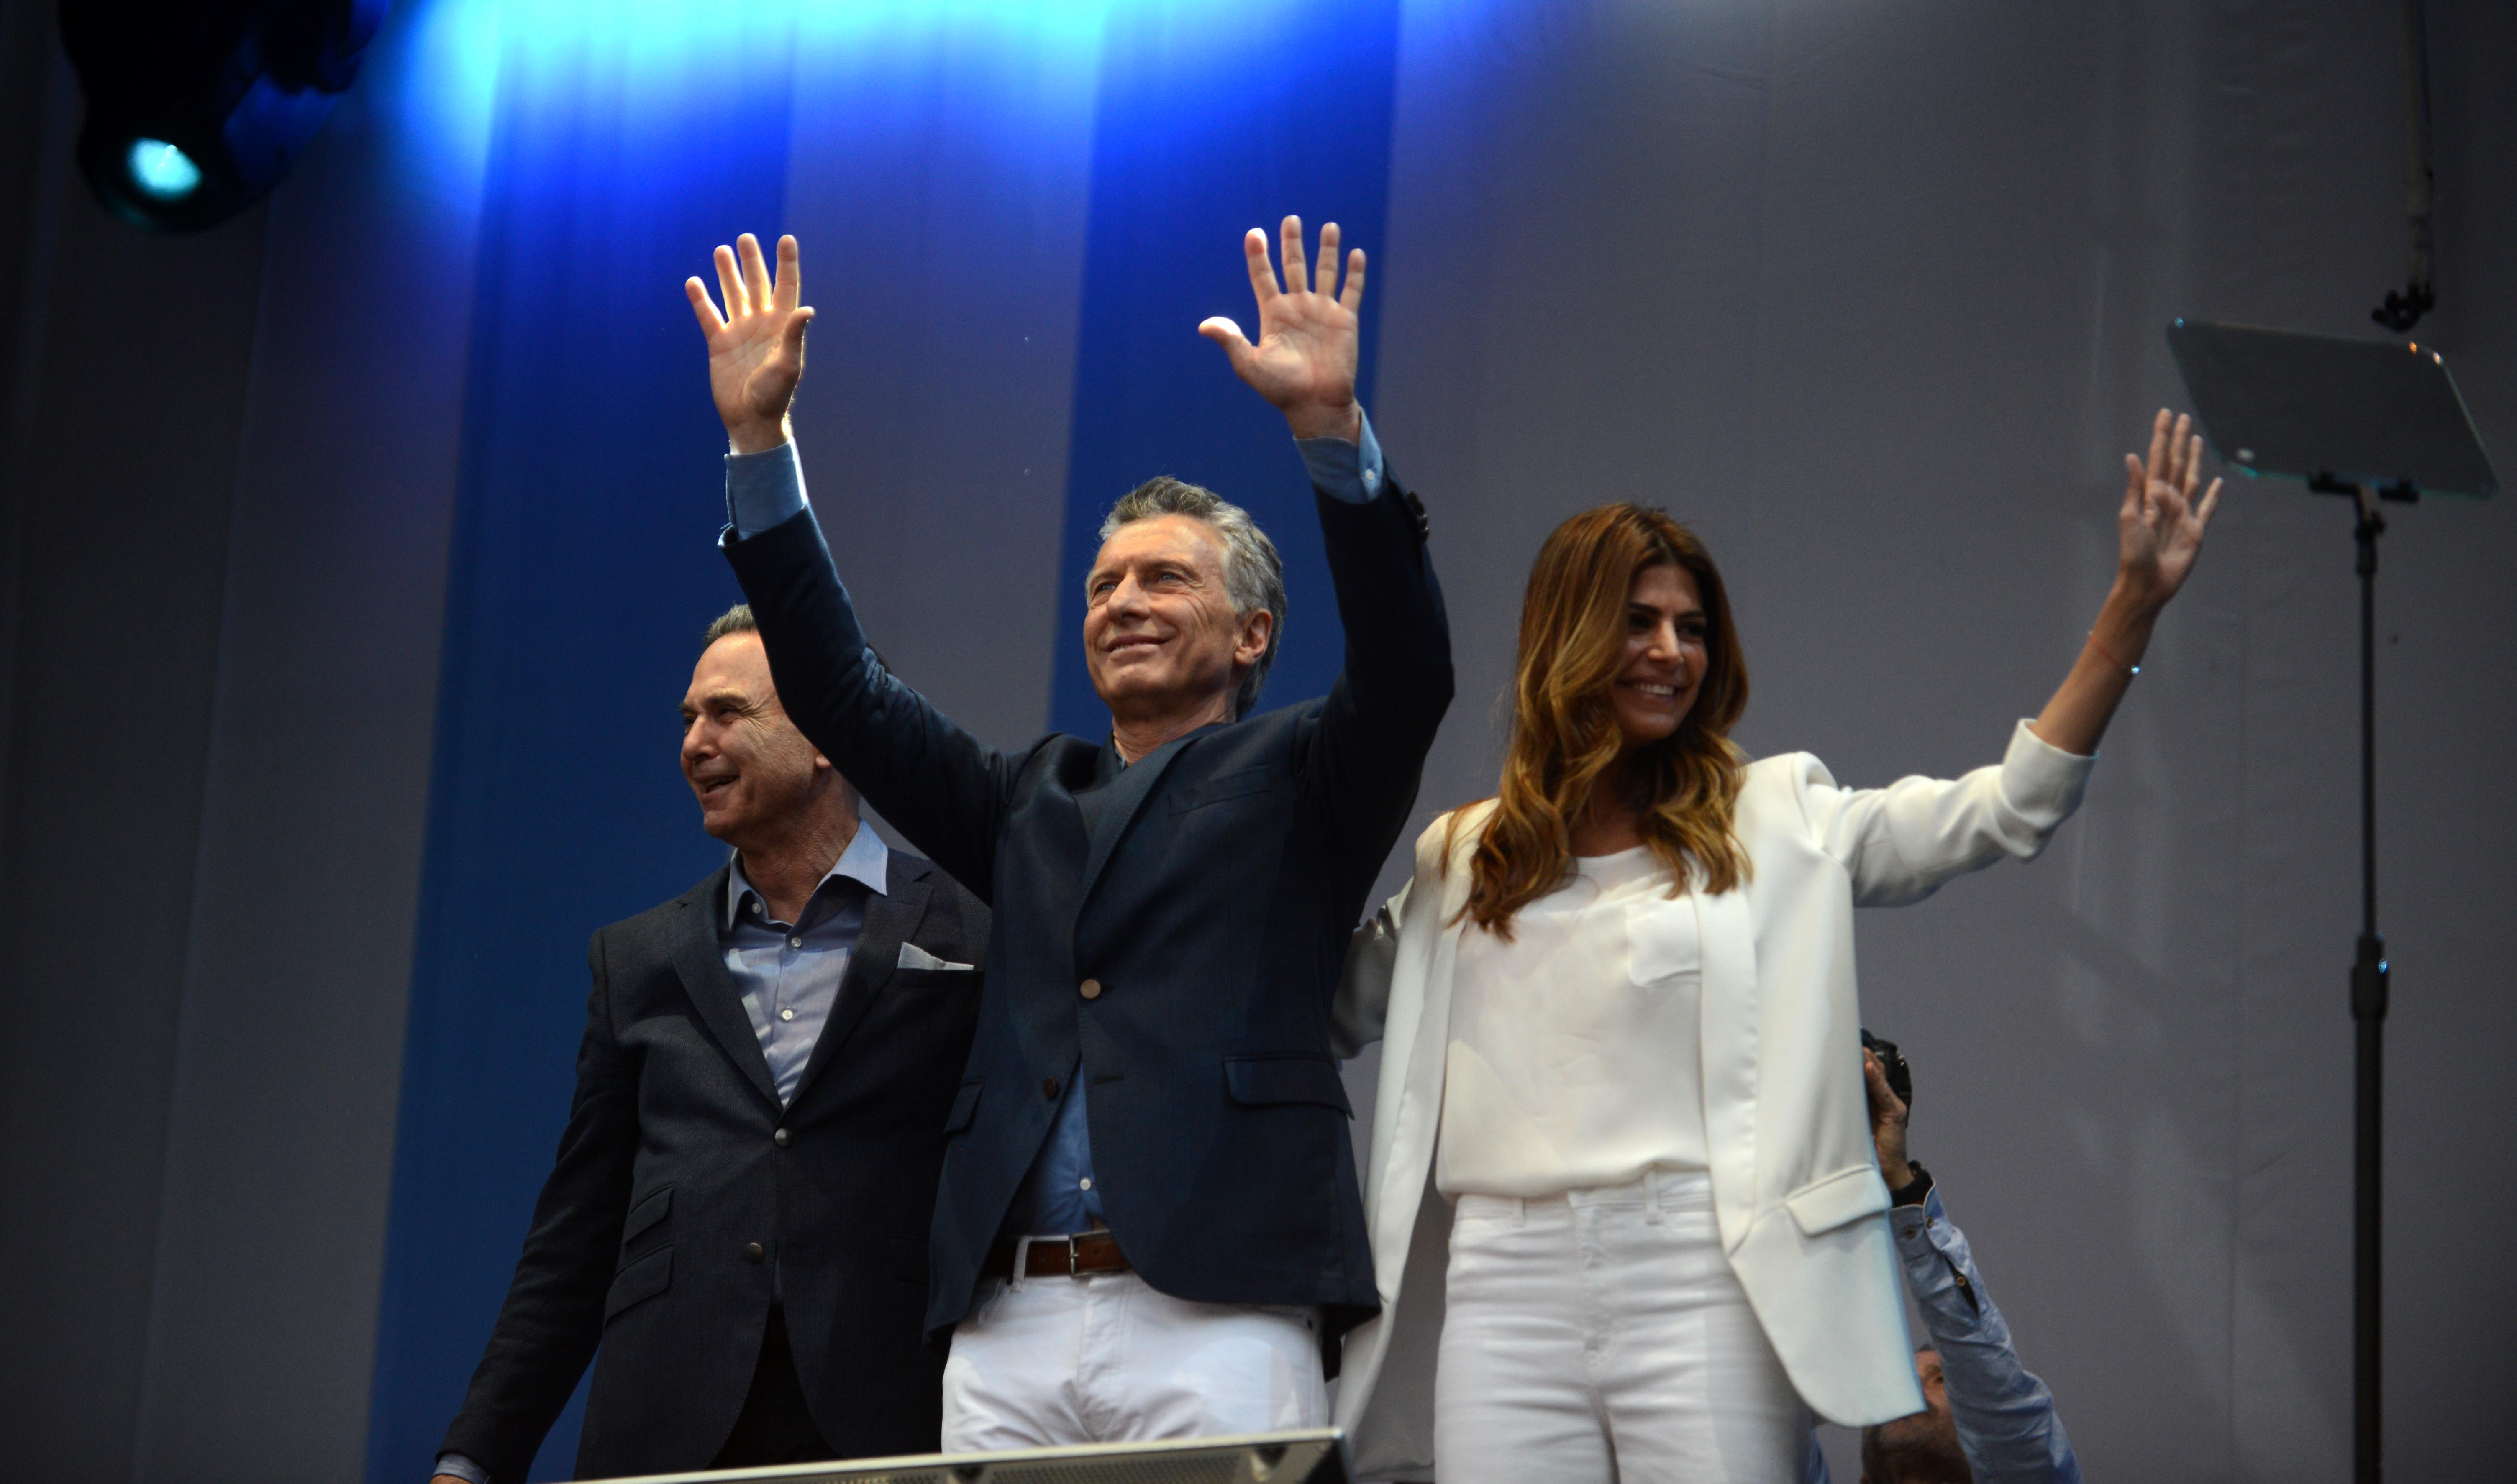 Pichetto, Macri y Awada saludando a la multitud (Presidencia)